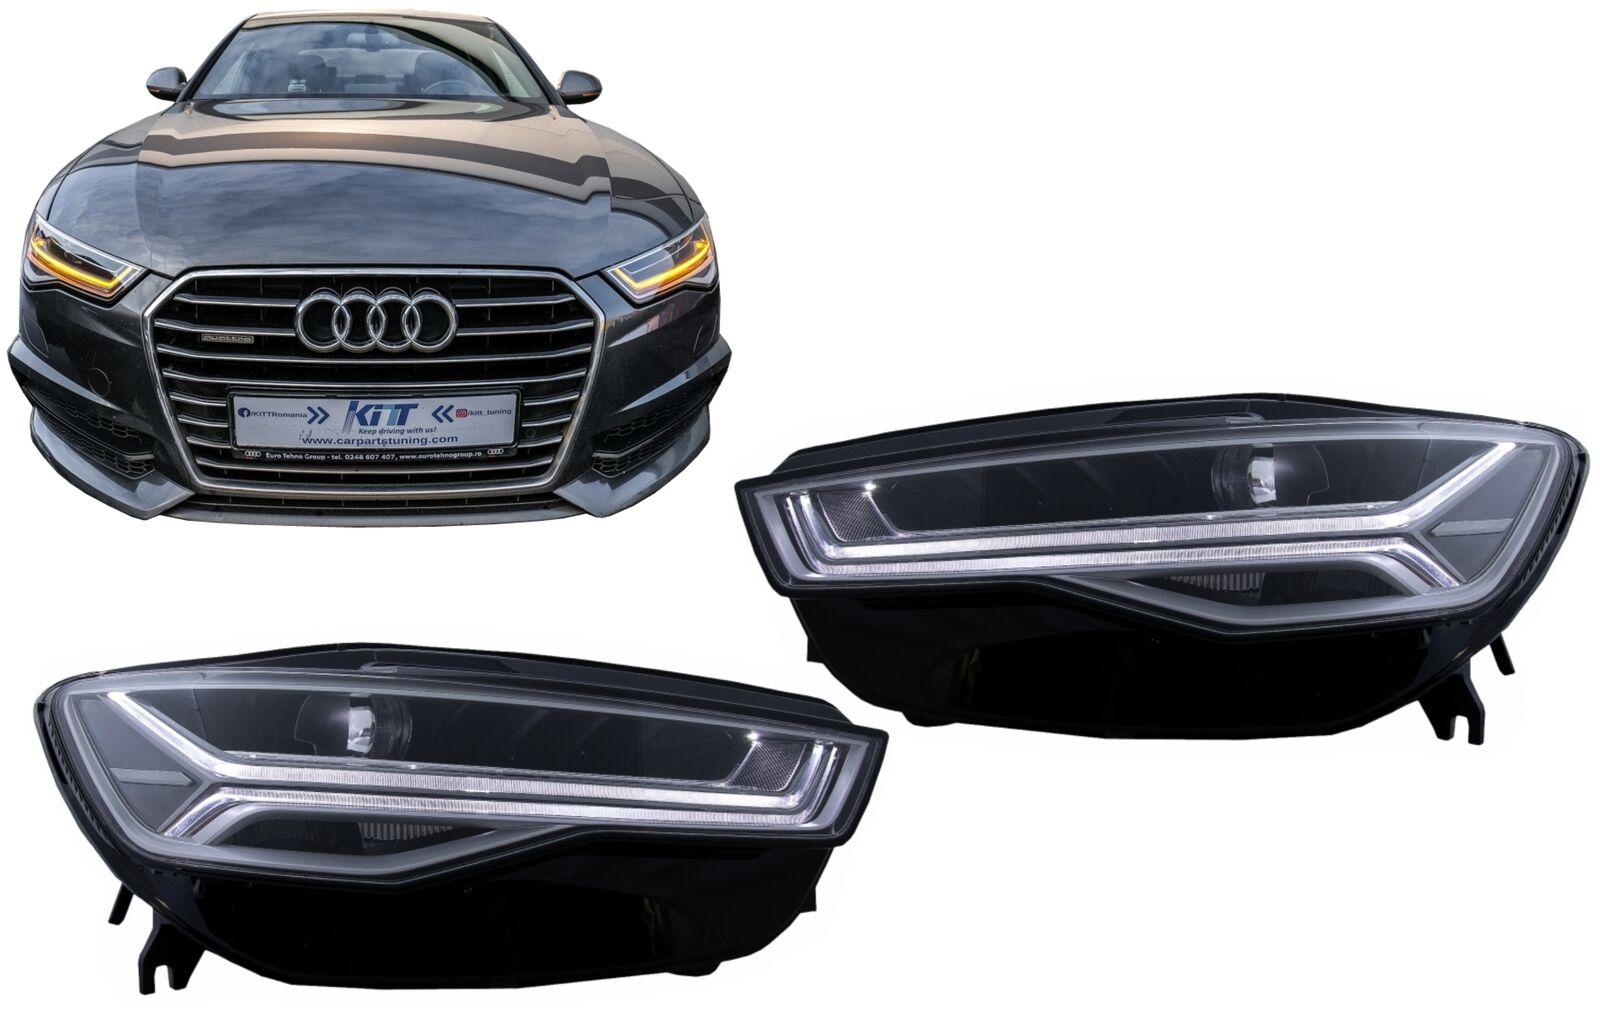 Full Led Headlights For Audi A6 4g C7 11 18 Facelift Matrix Look Dynamic Lights For Sale Online Ebay